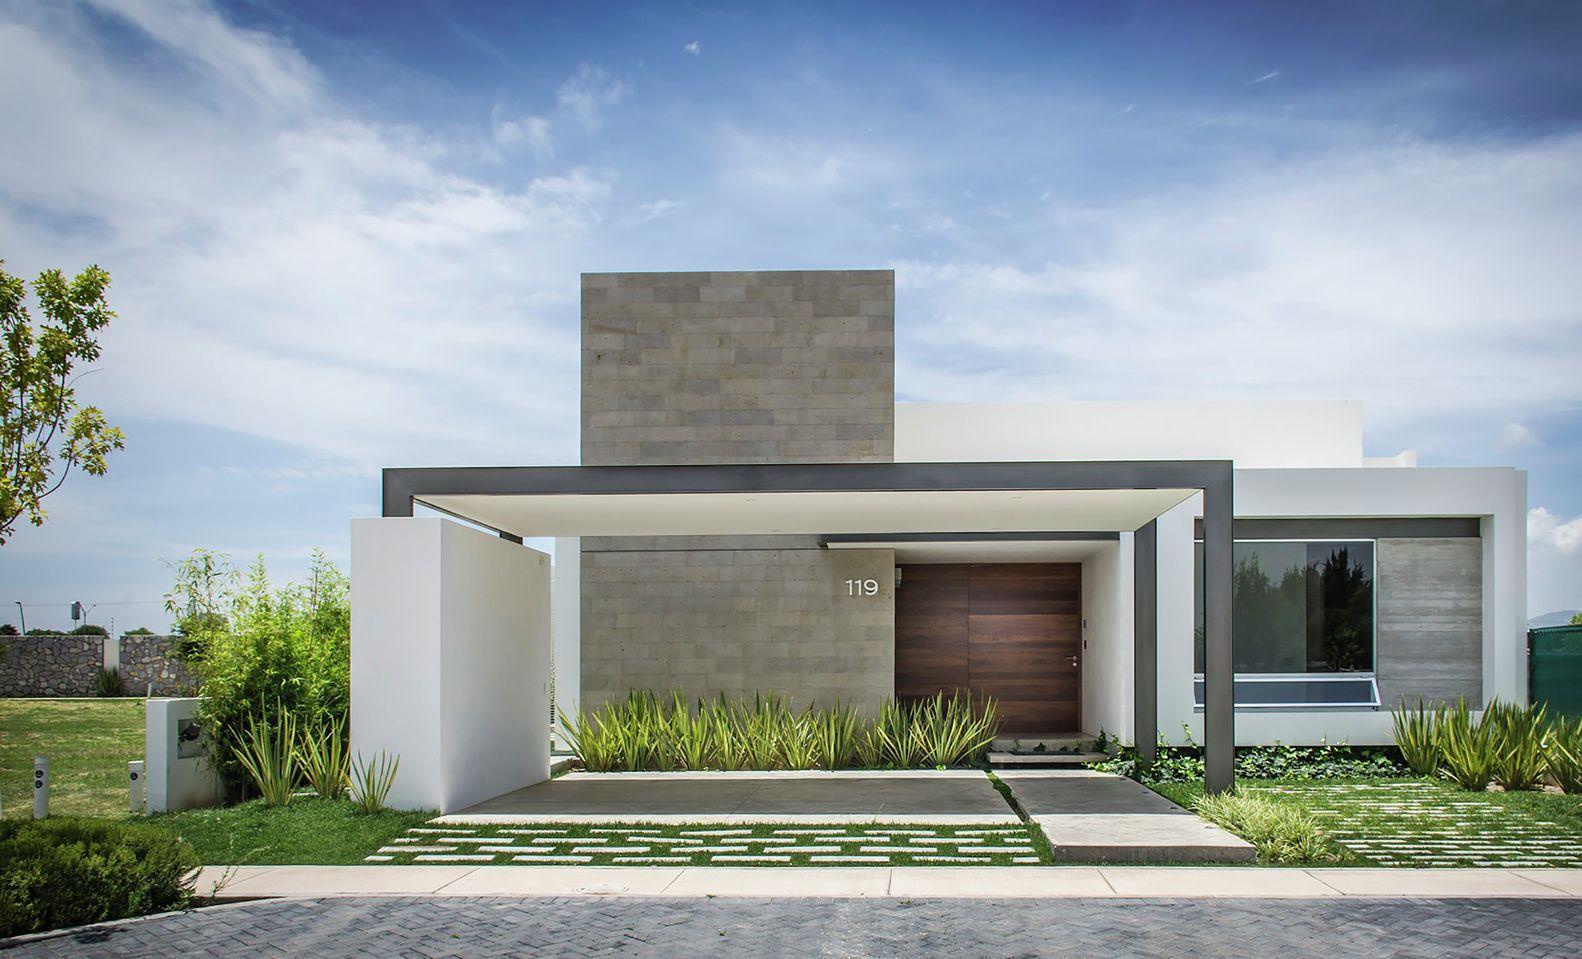 T02 adi arquitectura y dise o interior galer as - Arquitectura casas modernas ...